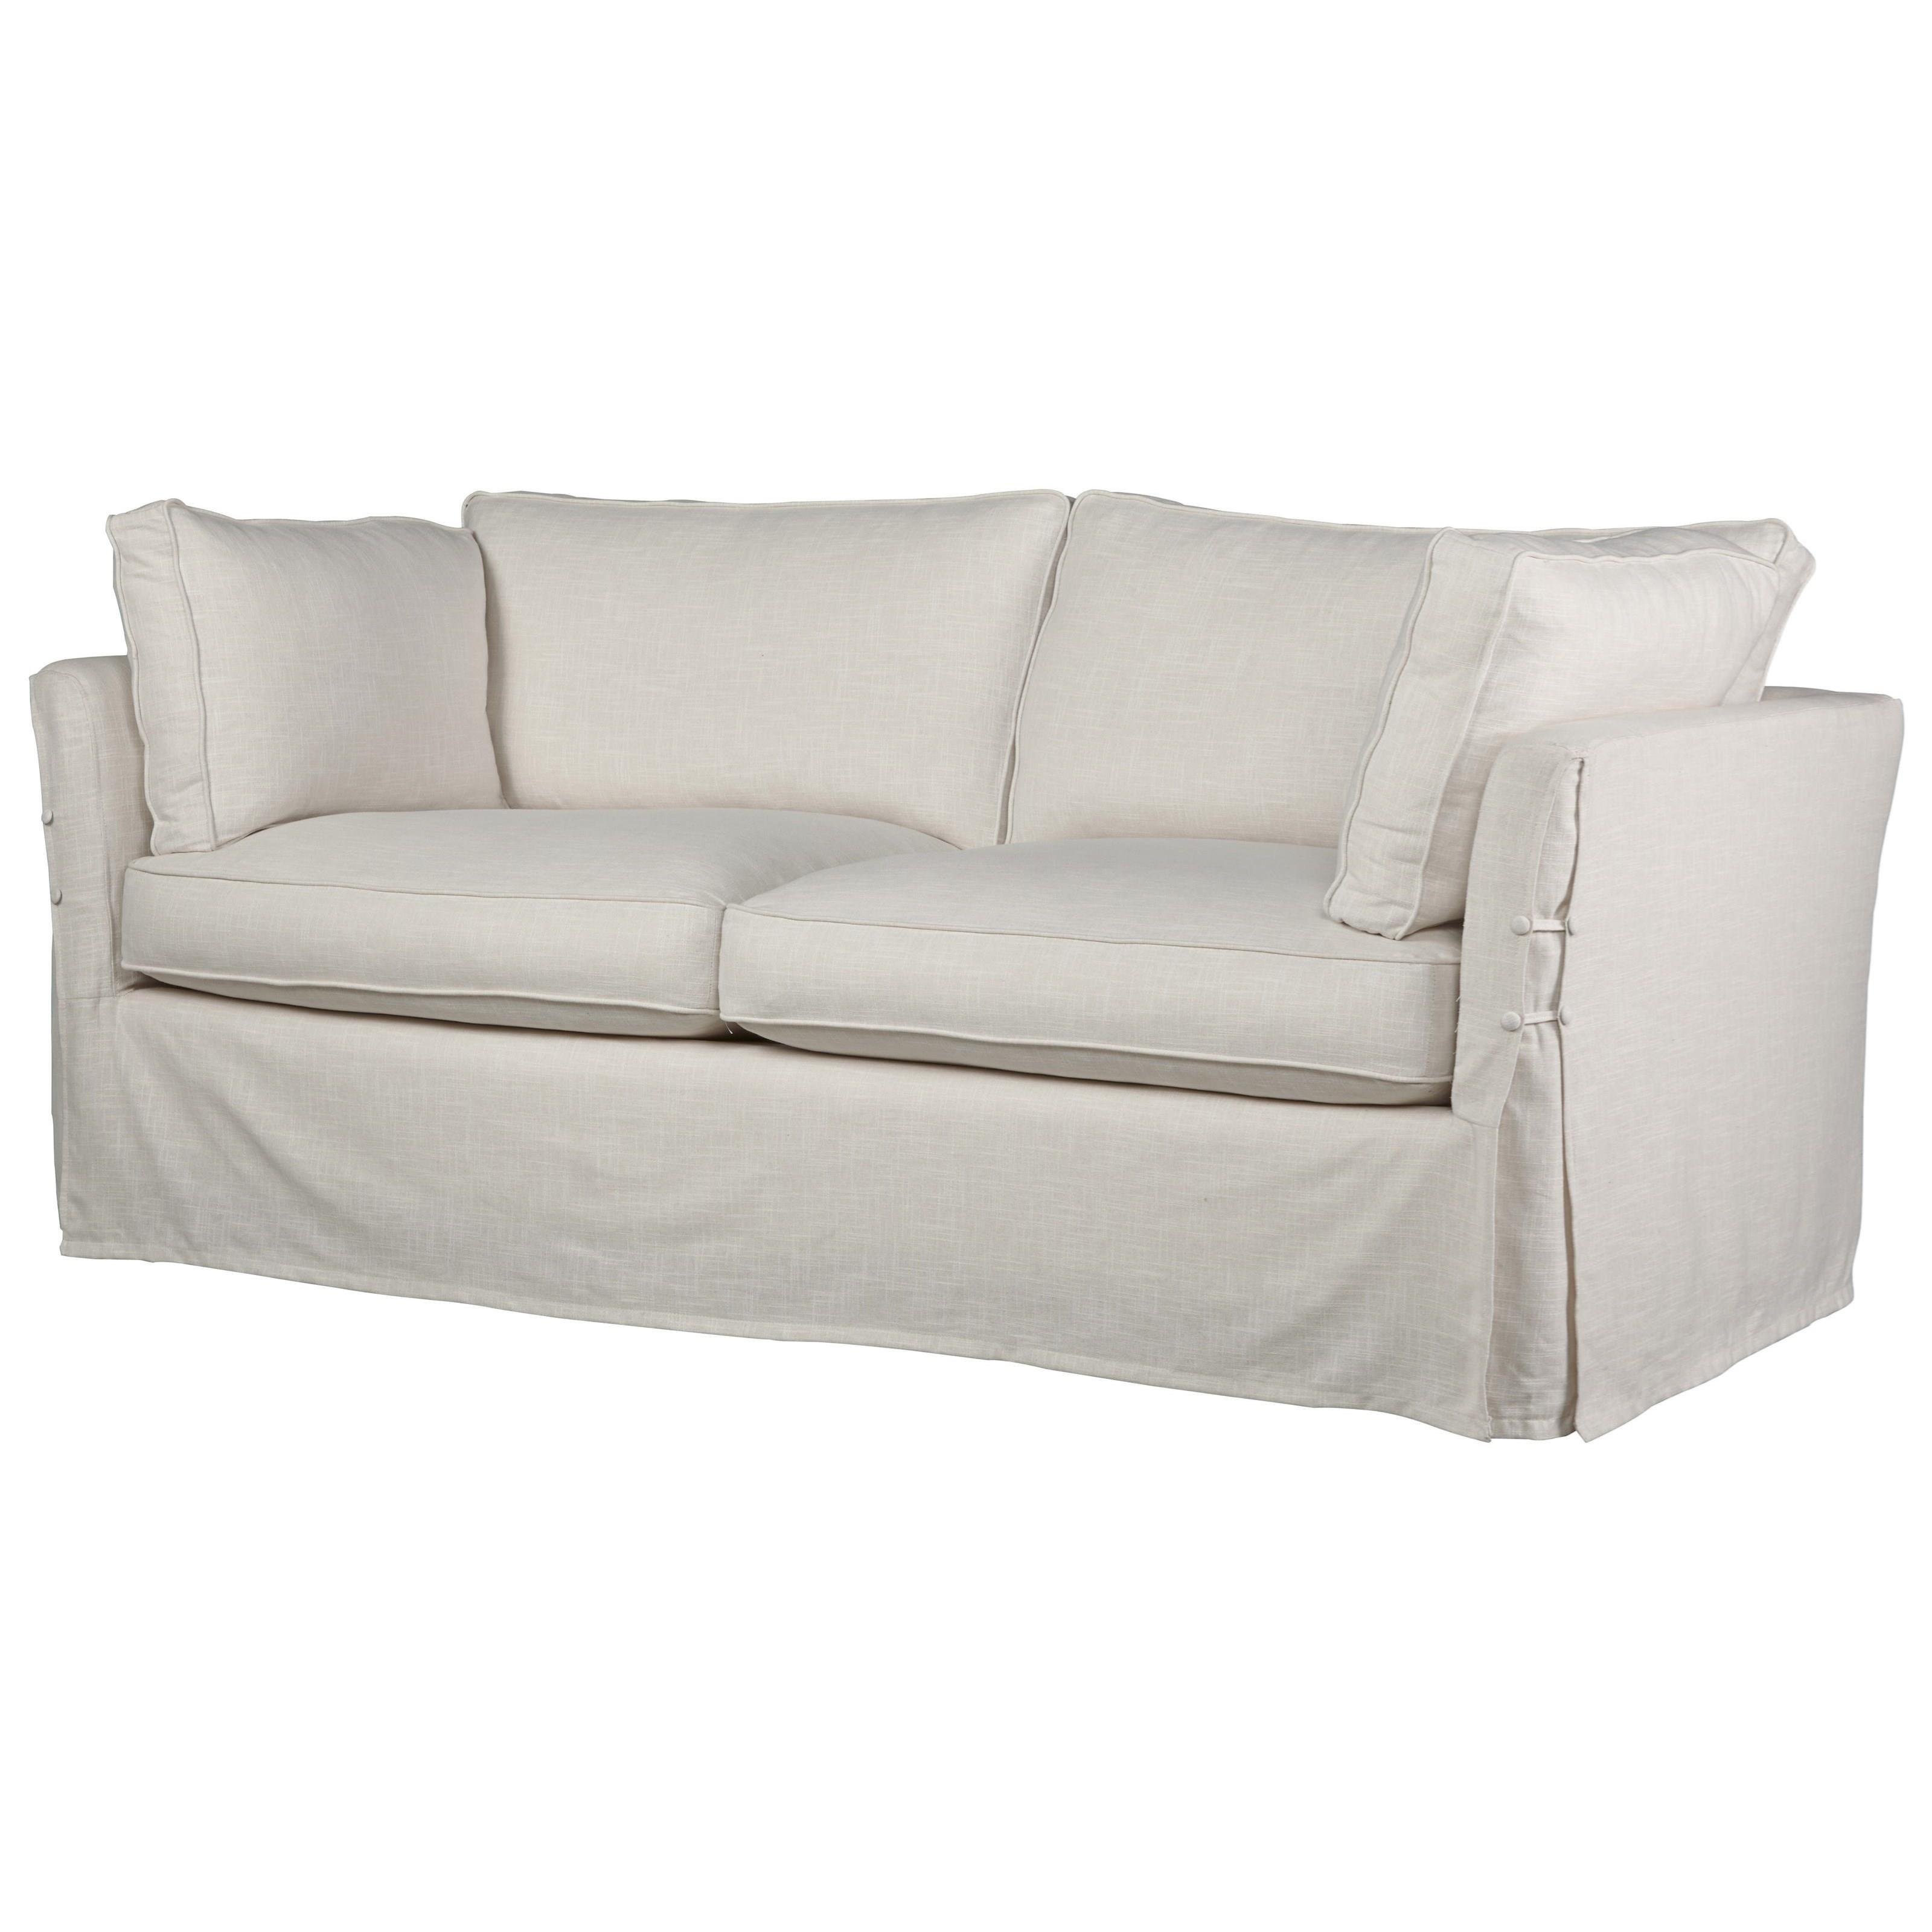 Universal Farley 773501 701 Farley Sofa In Performance